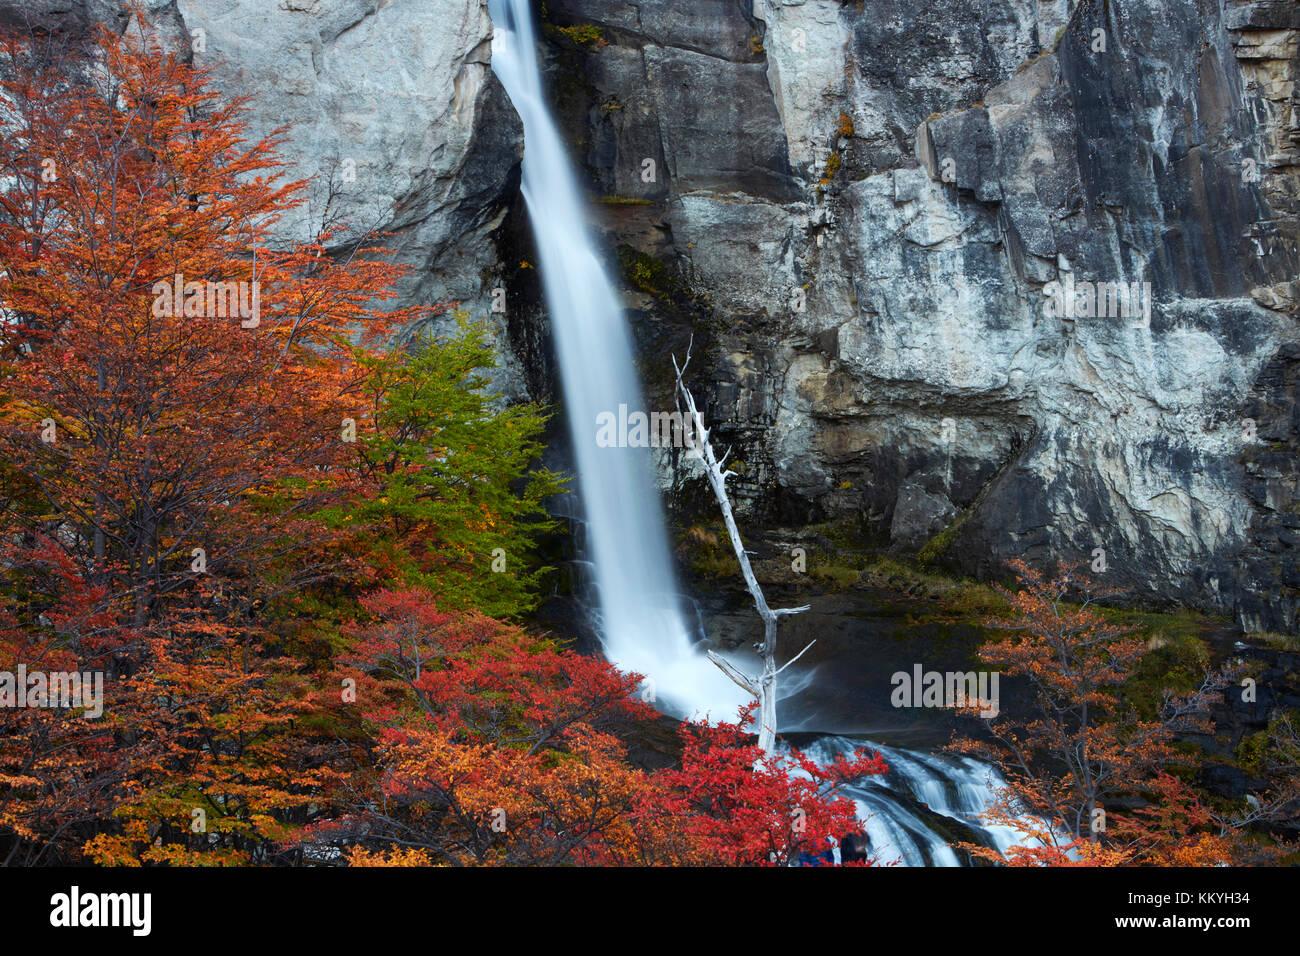 El Chorrillo Waterfall and lenga trees in autumn, near El Chalten, Parque Nacional Los Glaciares, Patagonia, Argentina, - Stock Image